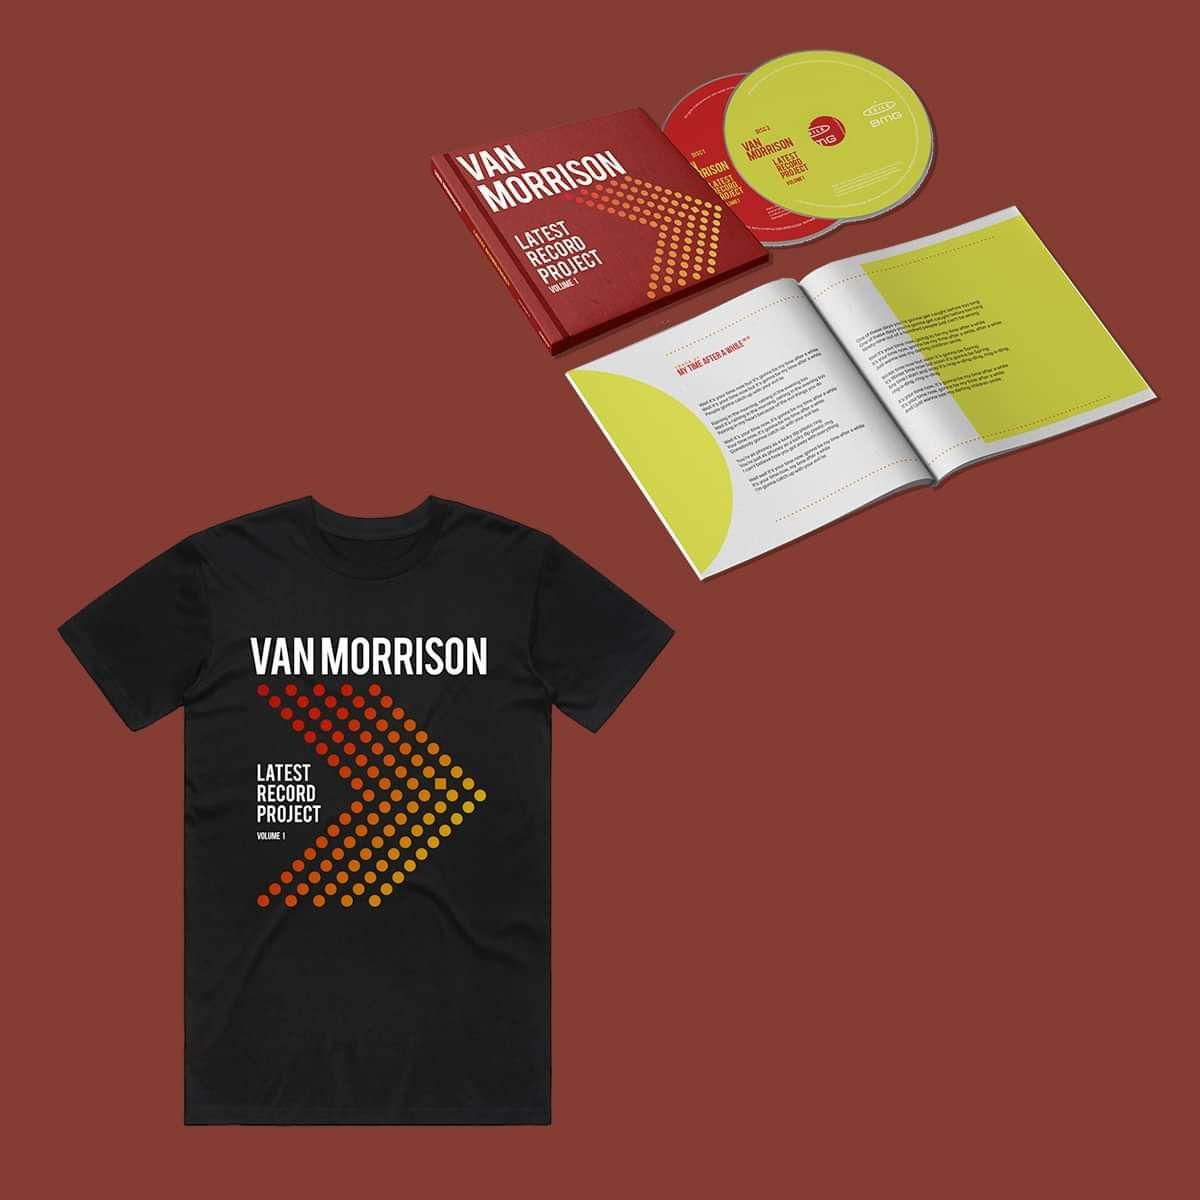 Van Morrison - Latest Record Project Volume 1 - Book Bound 2CD & T-Shirt Bundle - Van Morrison US